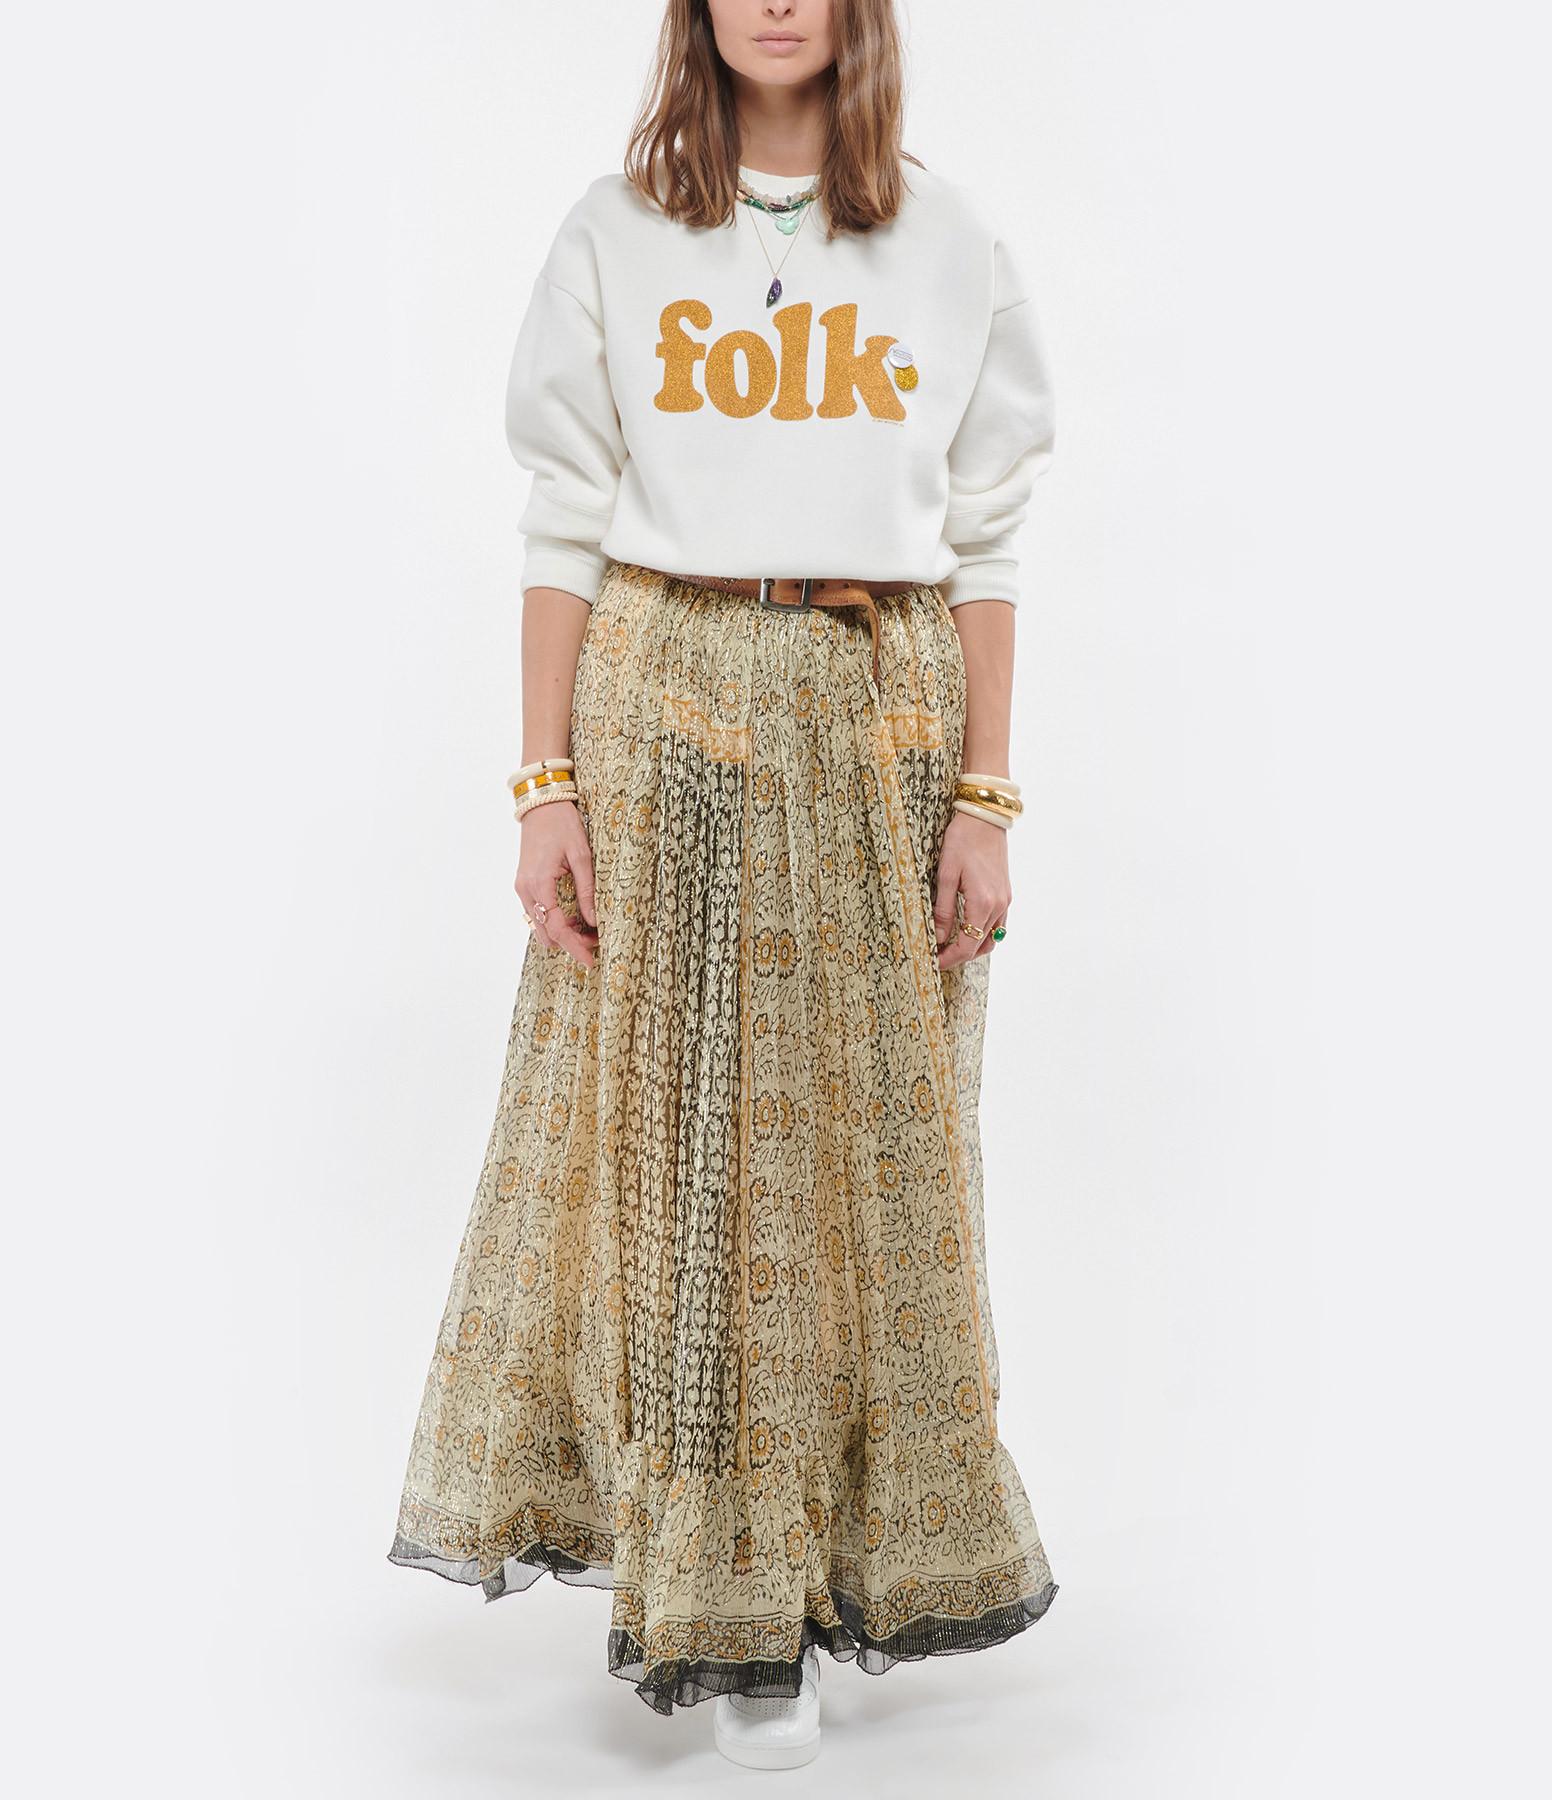 NEWTONE - Sweatshirt Roller Folk Coton Écru